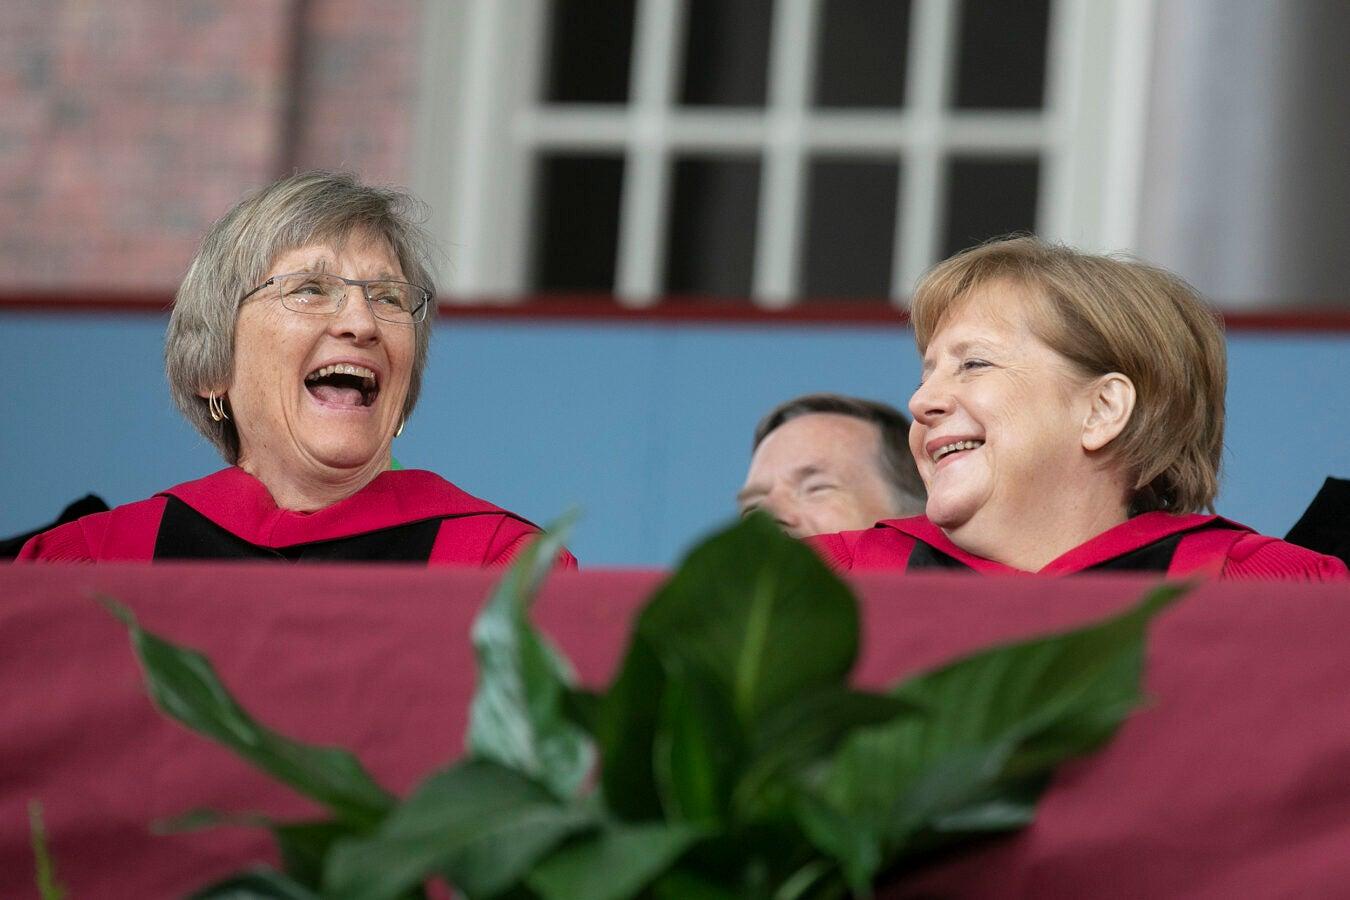 Drew Faust laughs with Angela Merkel